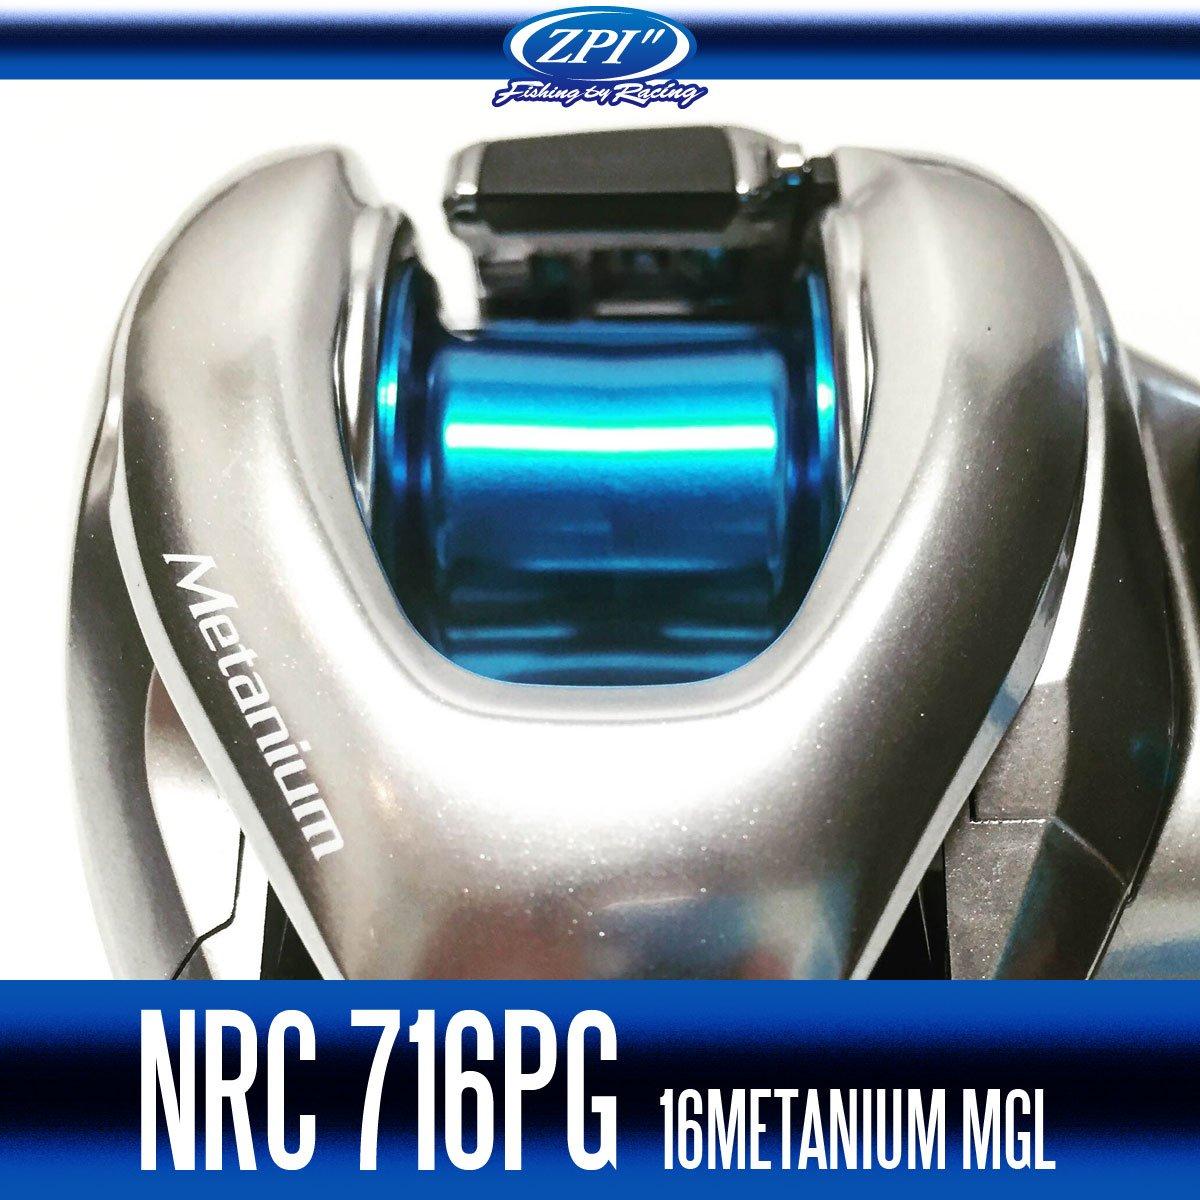 【ZPI】 シマノ 16メタニウムMGL用 NRC716PG スプール バイオレット  B01MDUES1Z